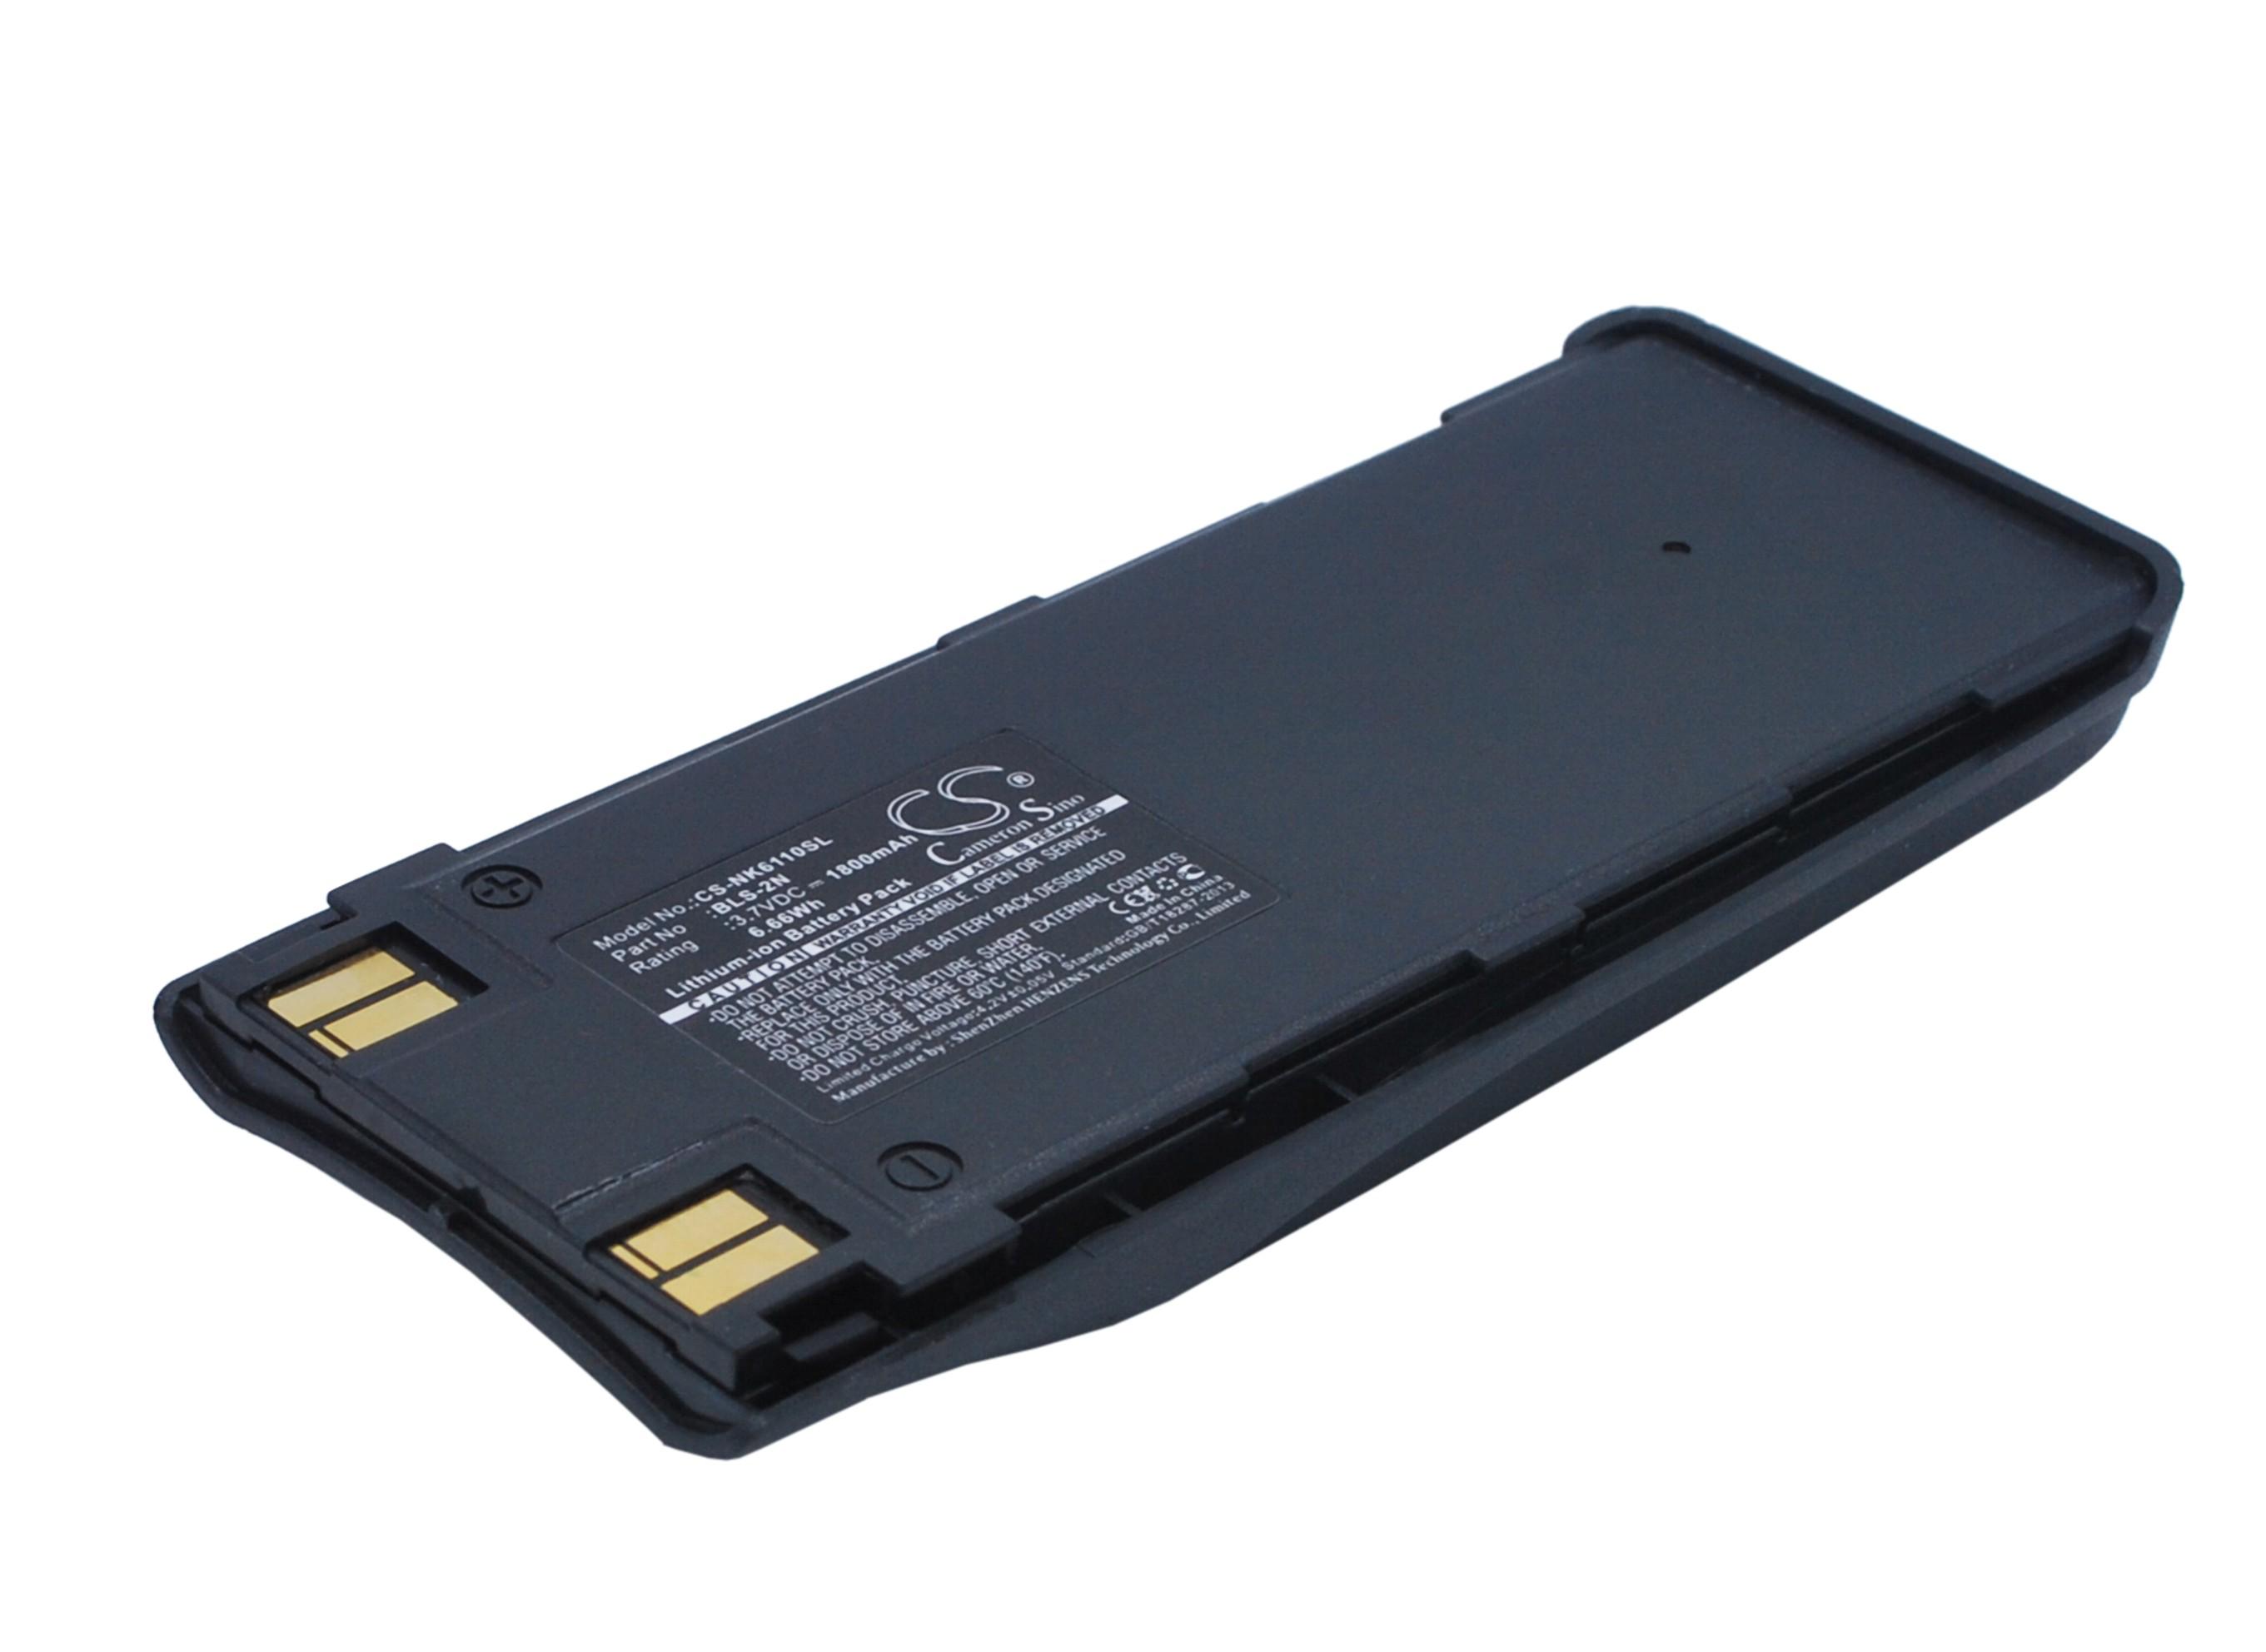 Cameron Sino baterie do mobilů pro NOKIA 7100 3.7V Li-ion 1800mAh černá - neoriginální